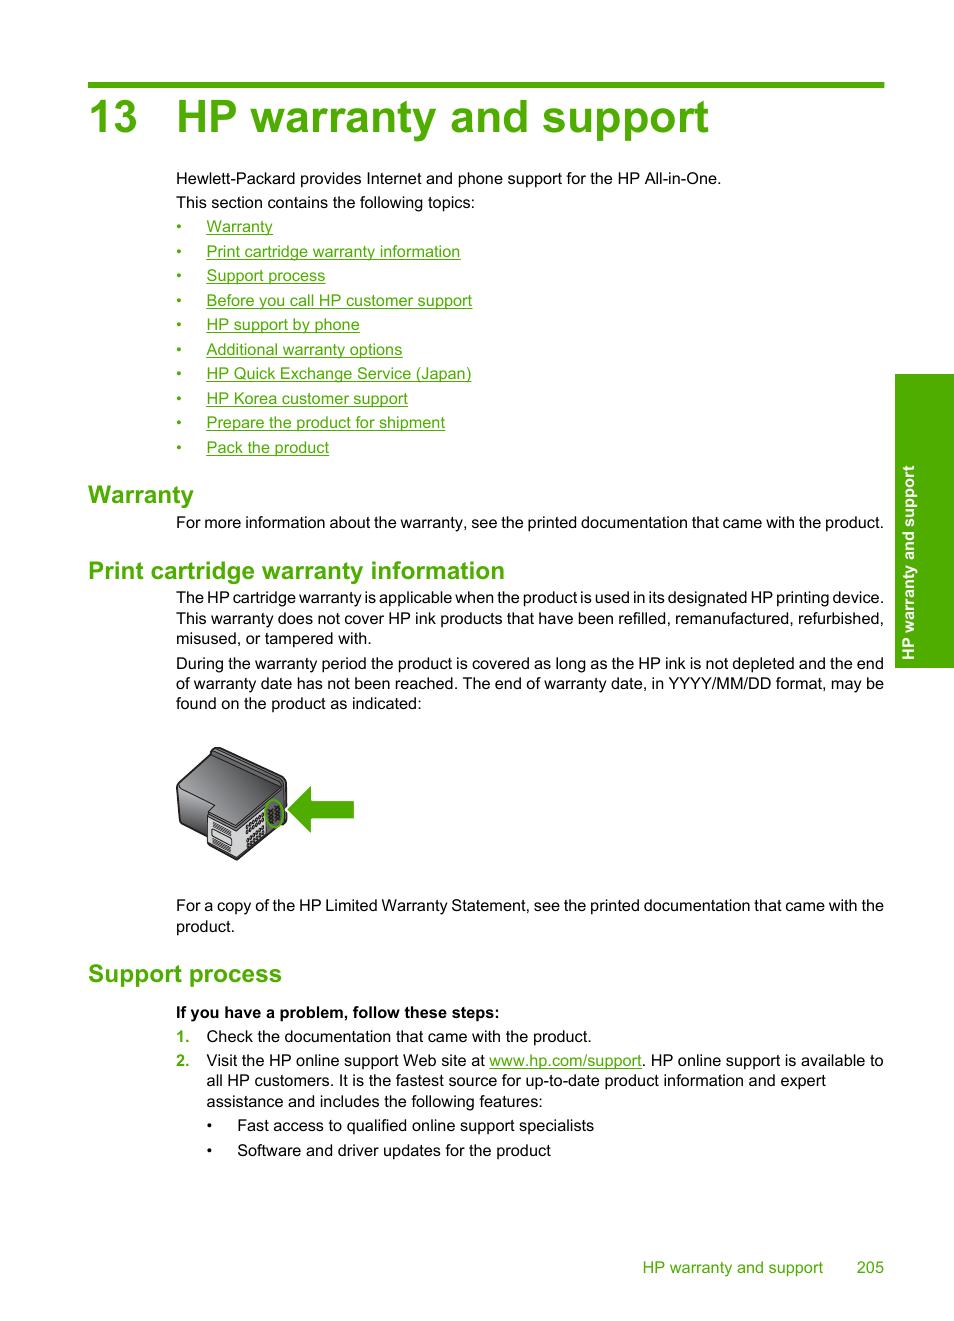 Hp warranty and support, Warranty, Print cartridge warranty information |  Support process, 13